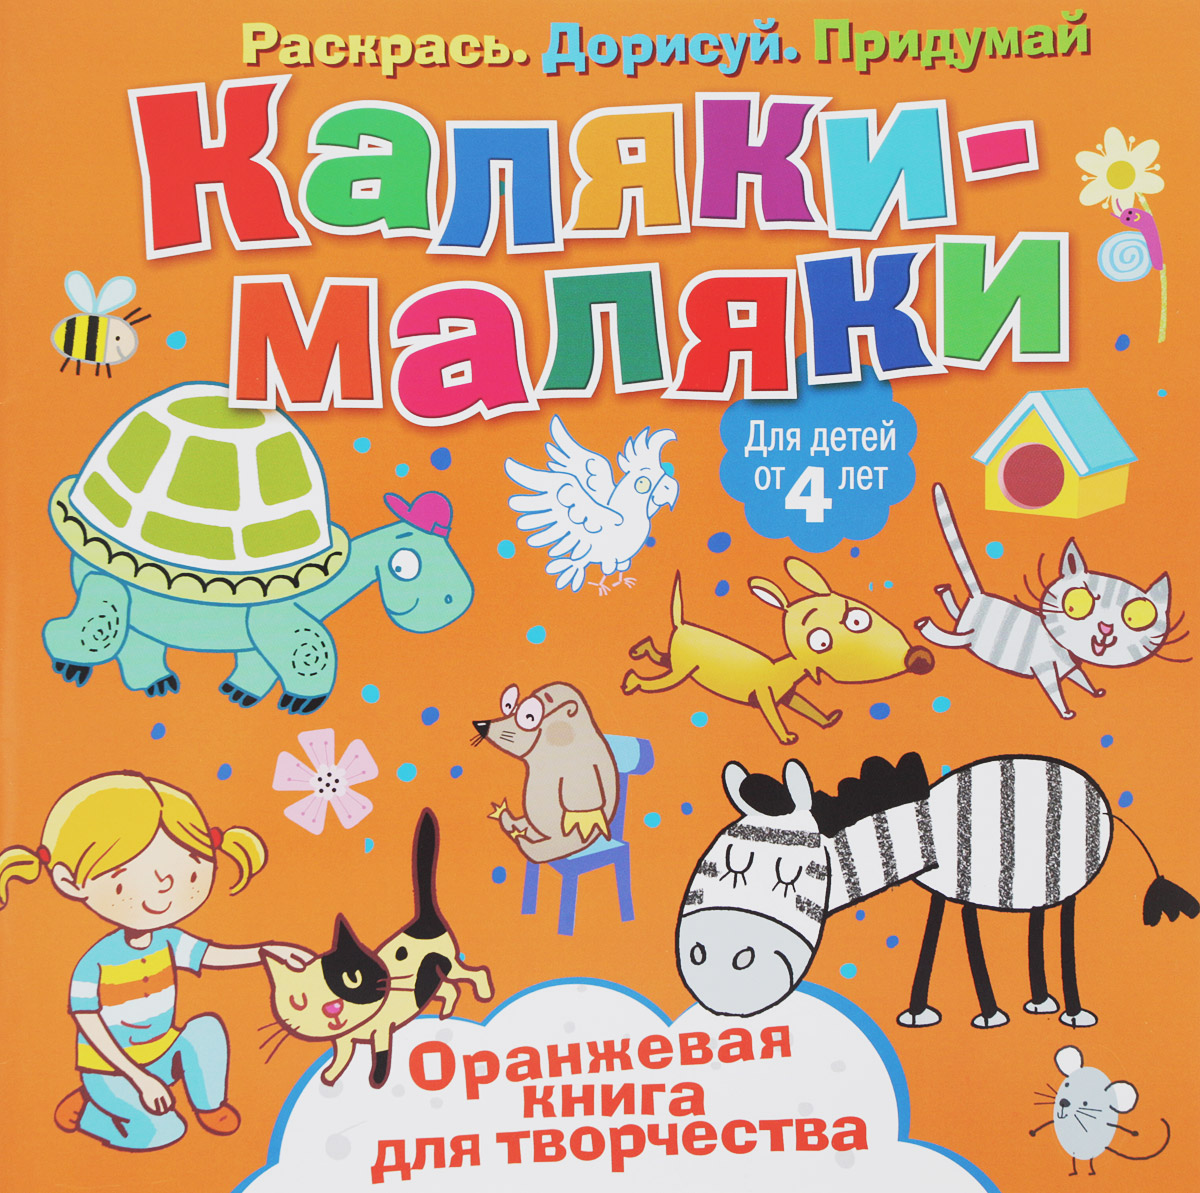 Каляки-маляки. Оранжевая книга для творчества